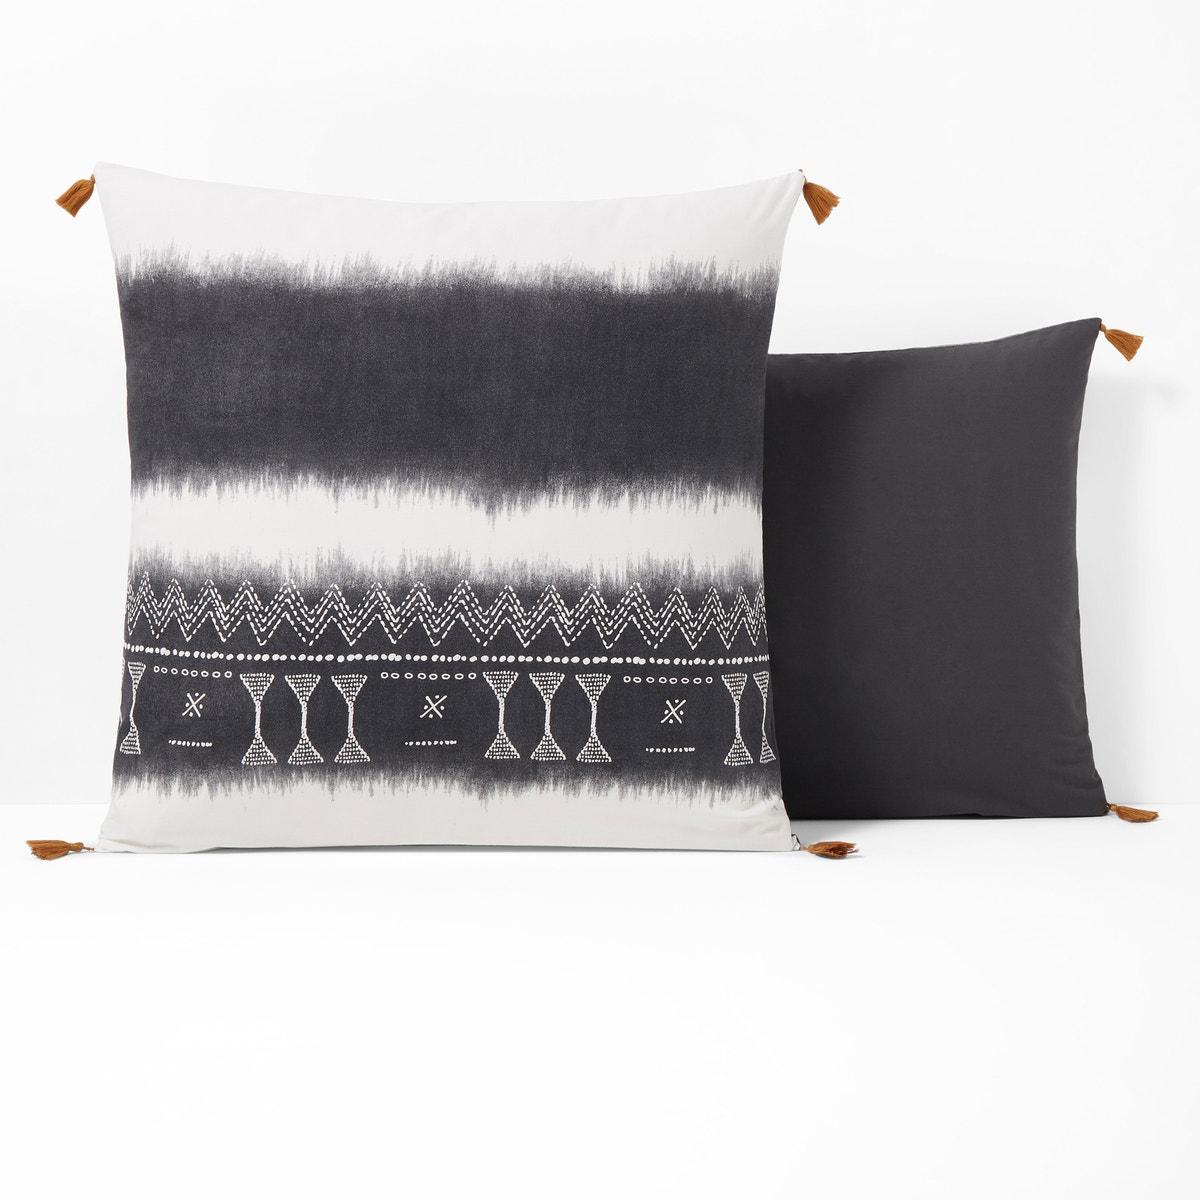 Yoruba コットン プリント枕カバー